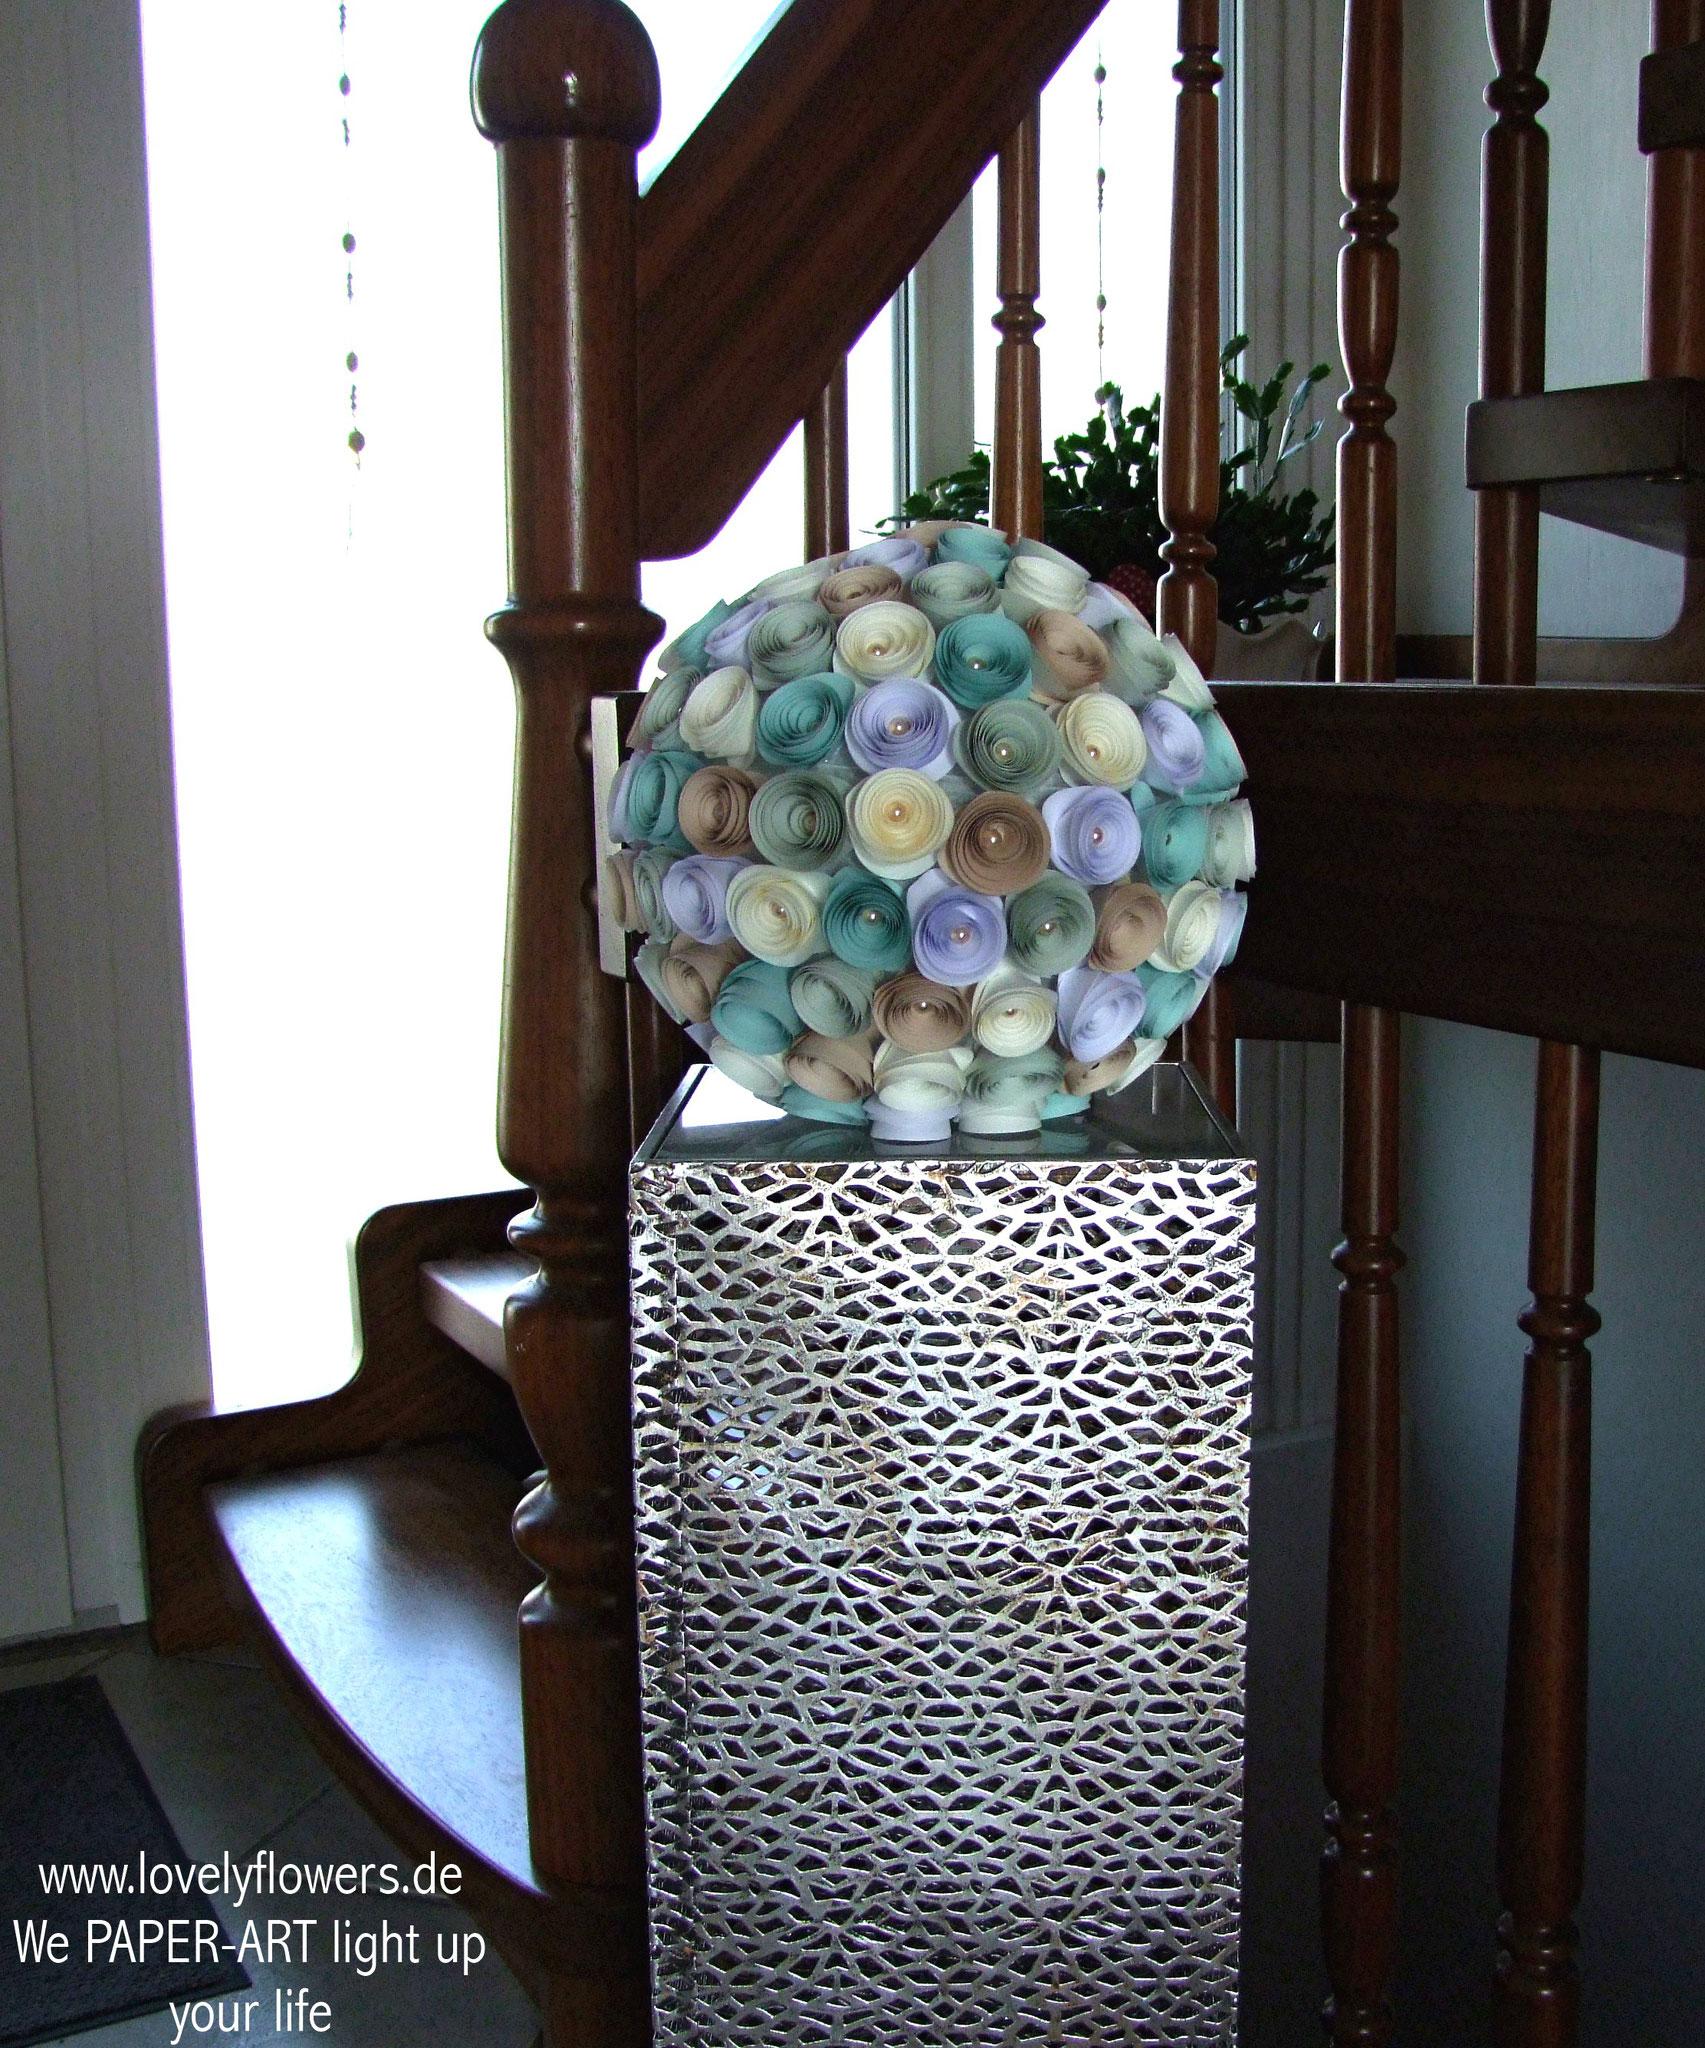 www.lovelyflowers.de - Paper Art Lampen verschönern Flure!